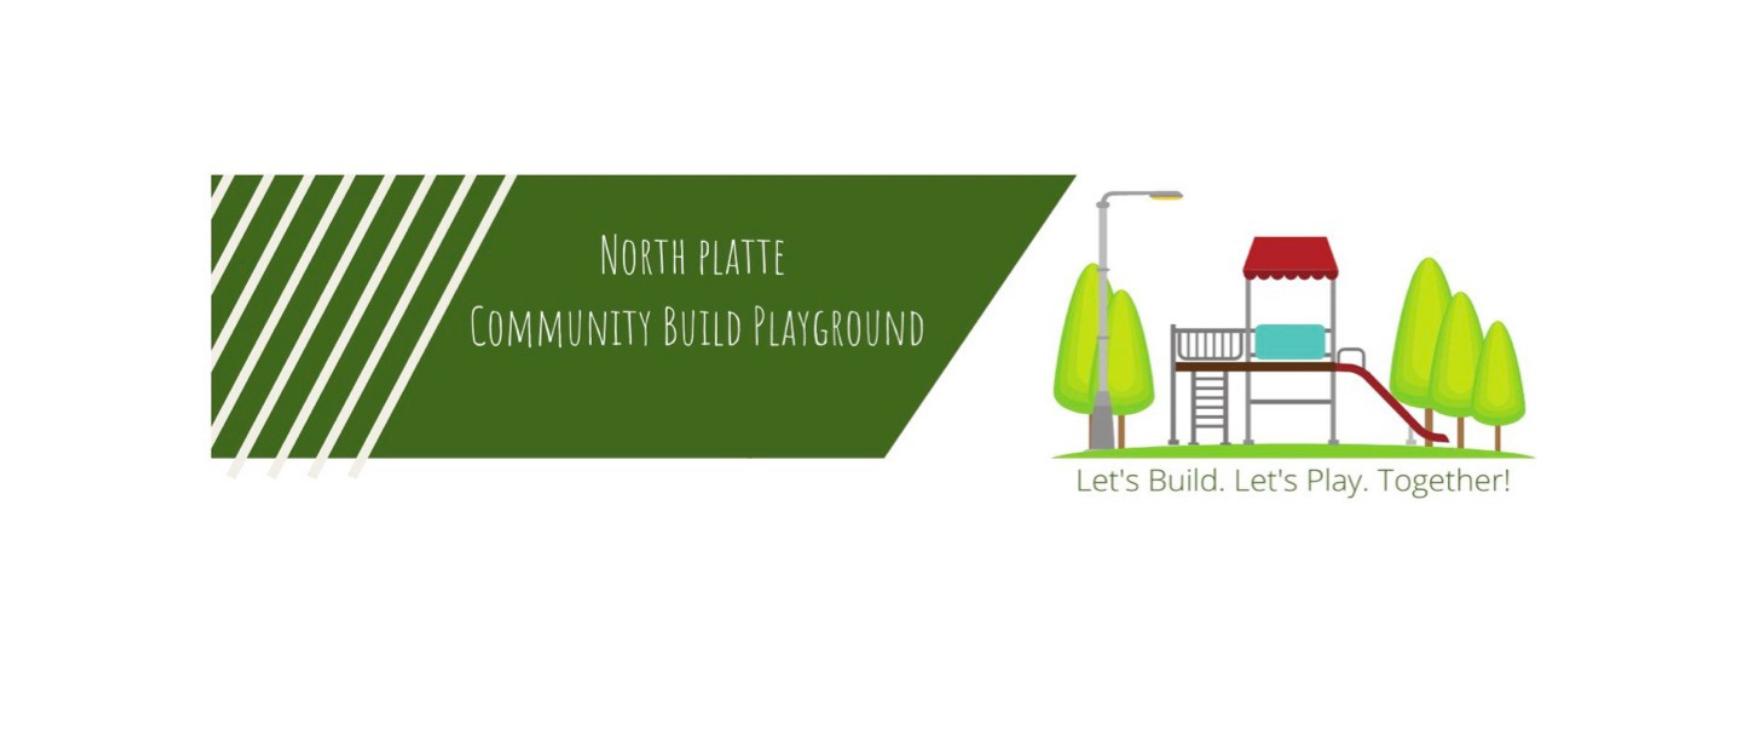 Community Build Playground